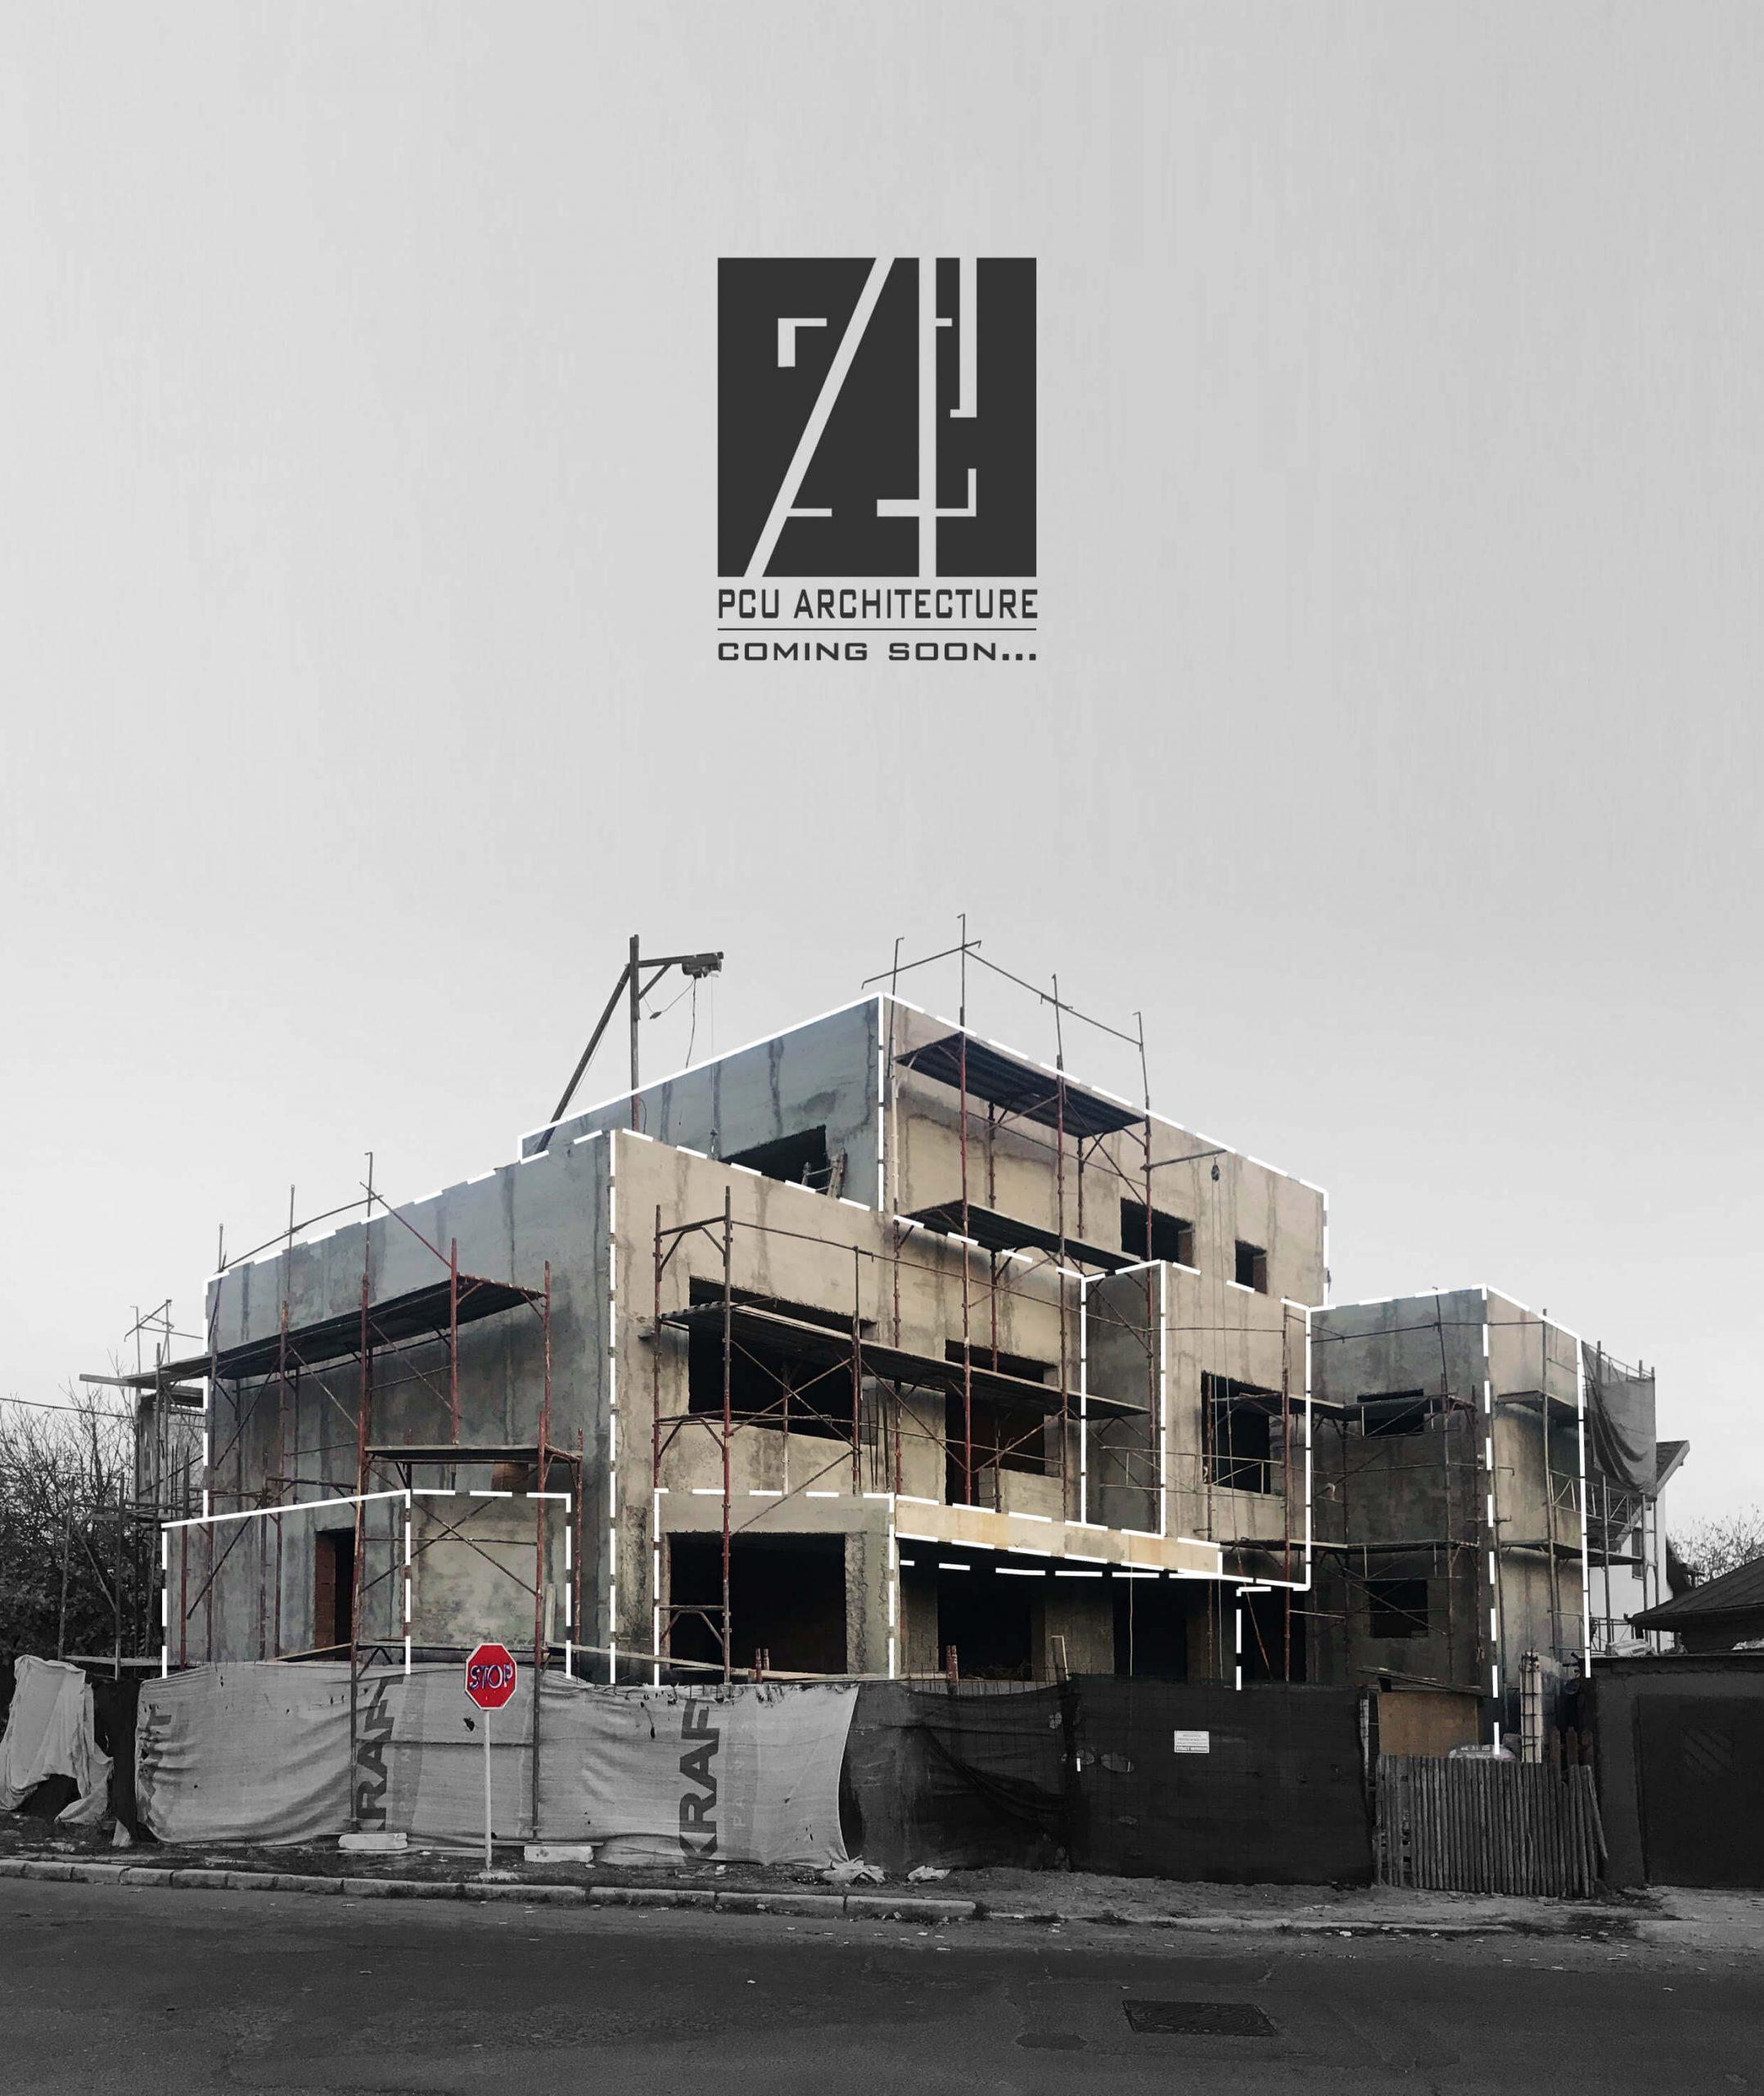 02_ARH_CASA 2 – BUZAU (7)